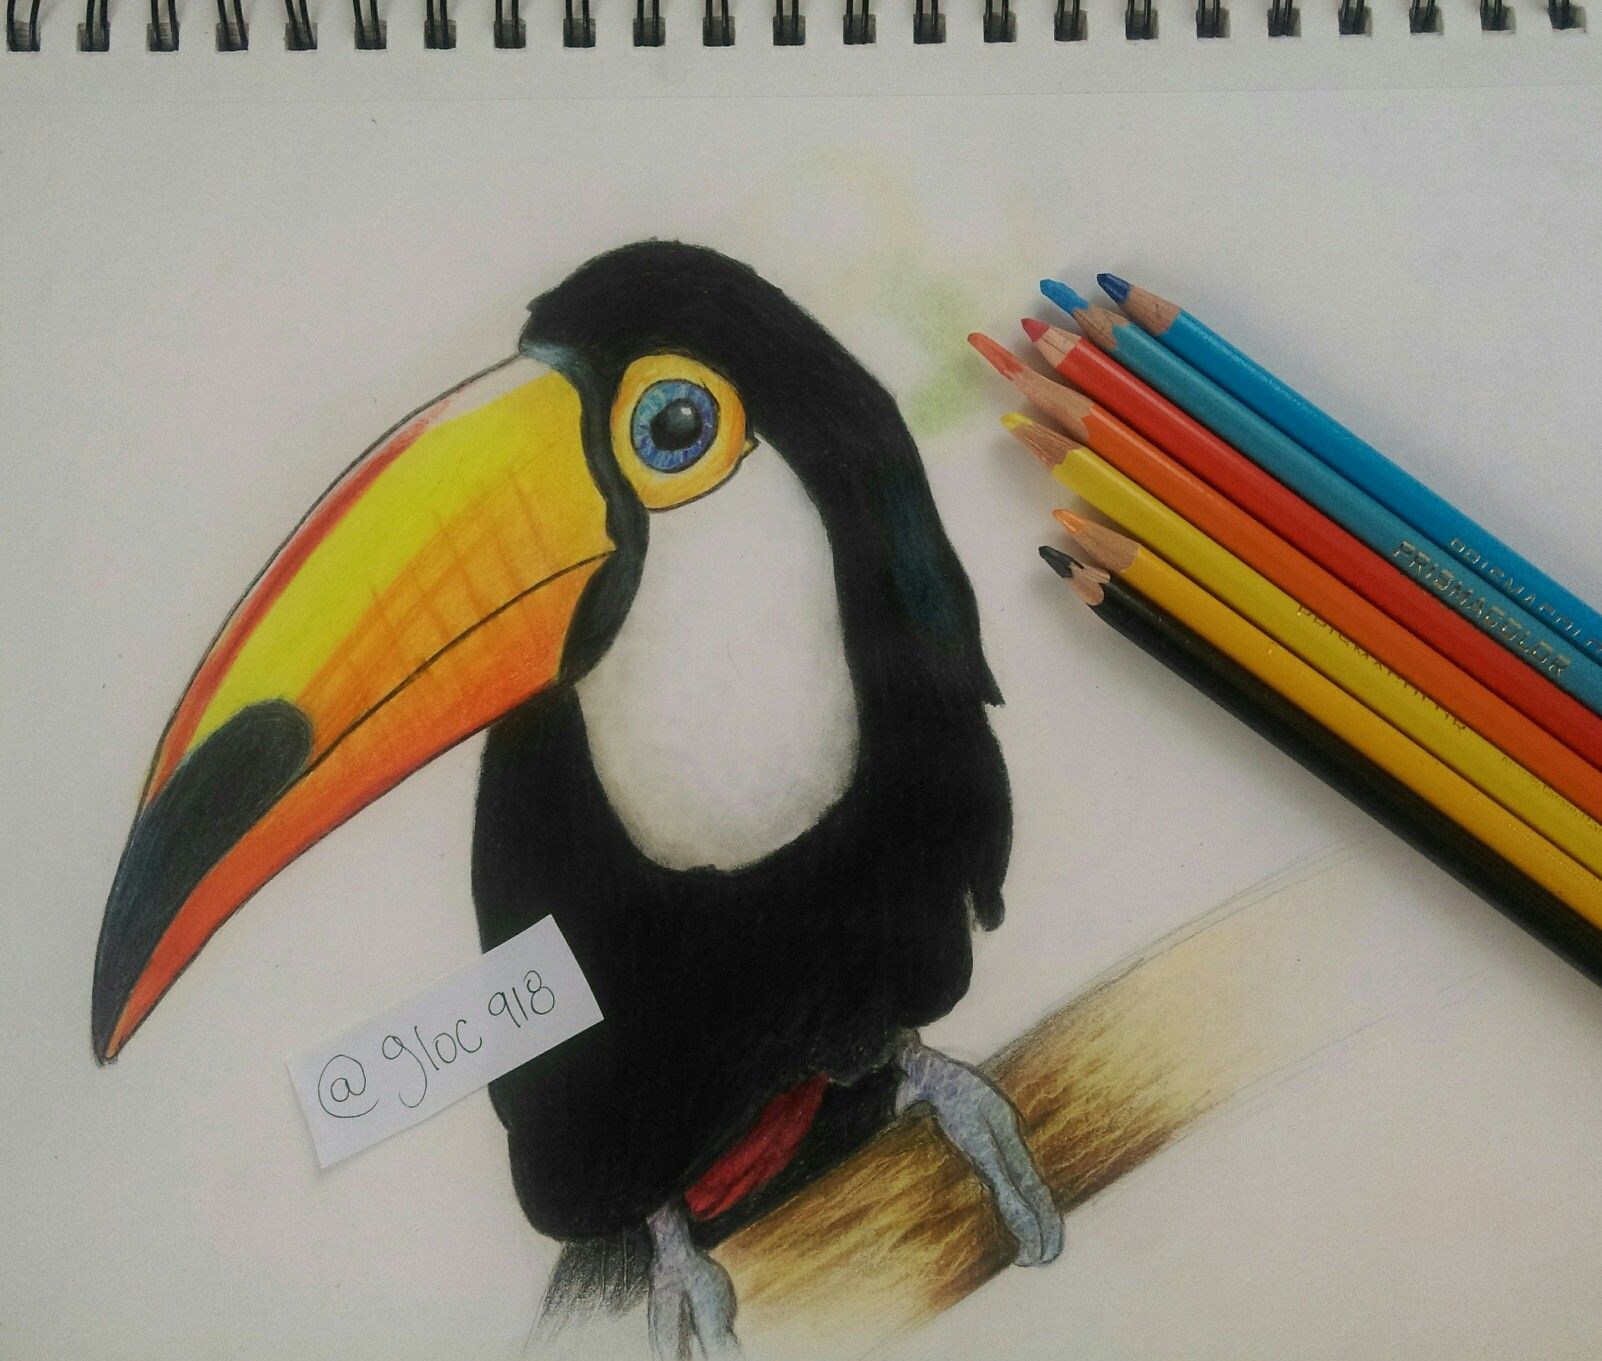 Tucán Dibujo a color | dibujo | Pinterest | Dibujo y Color